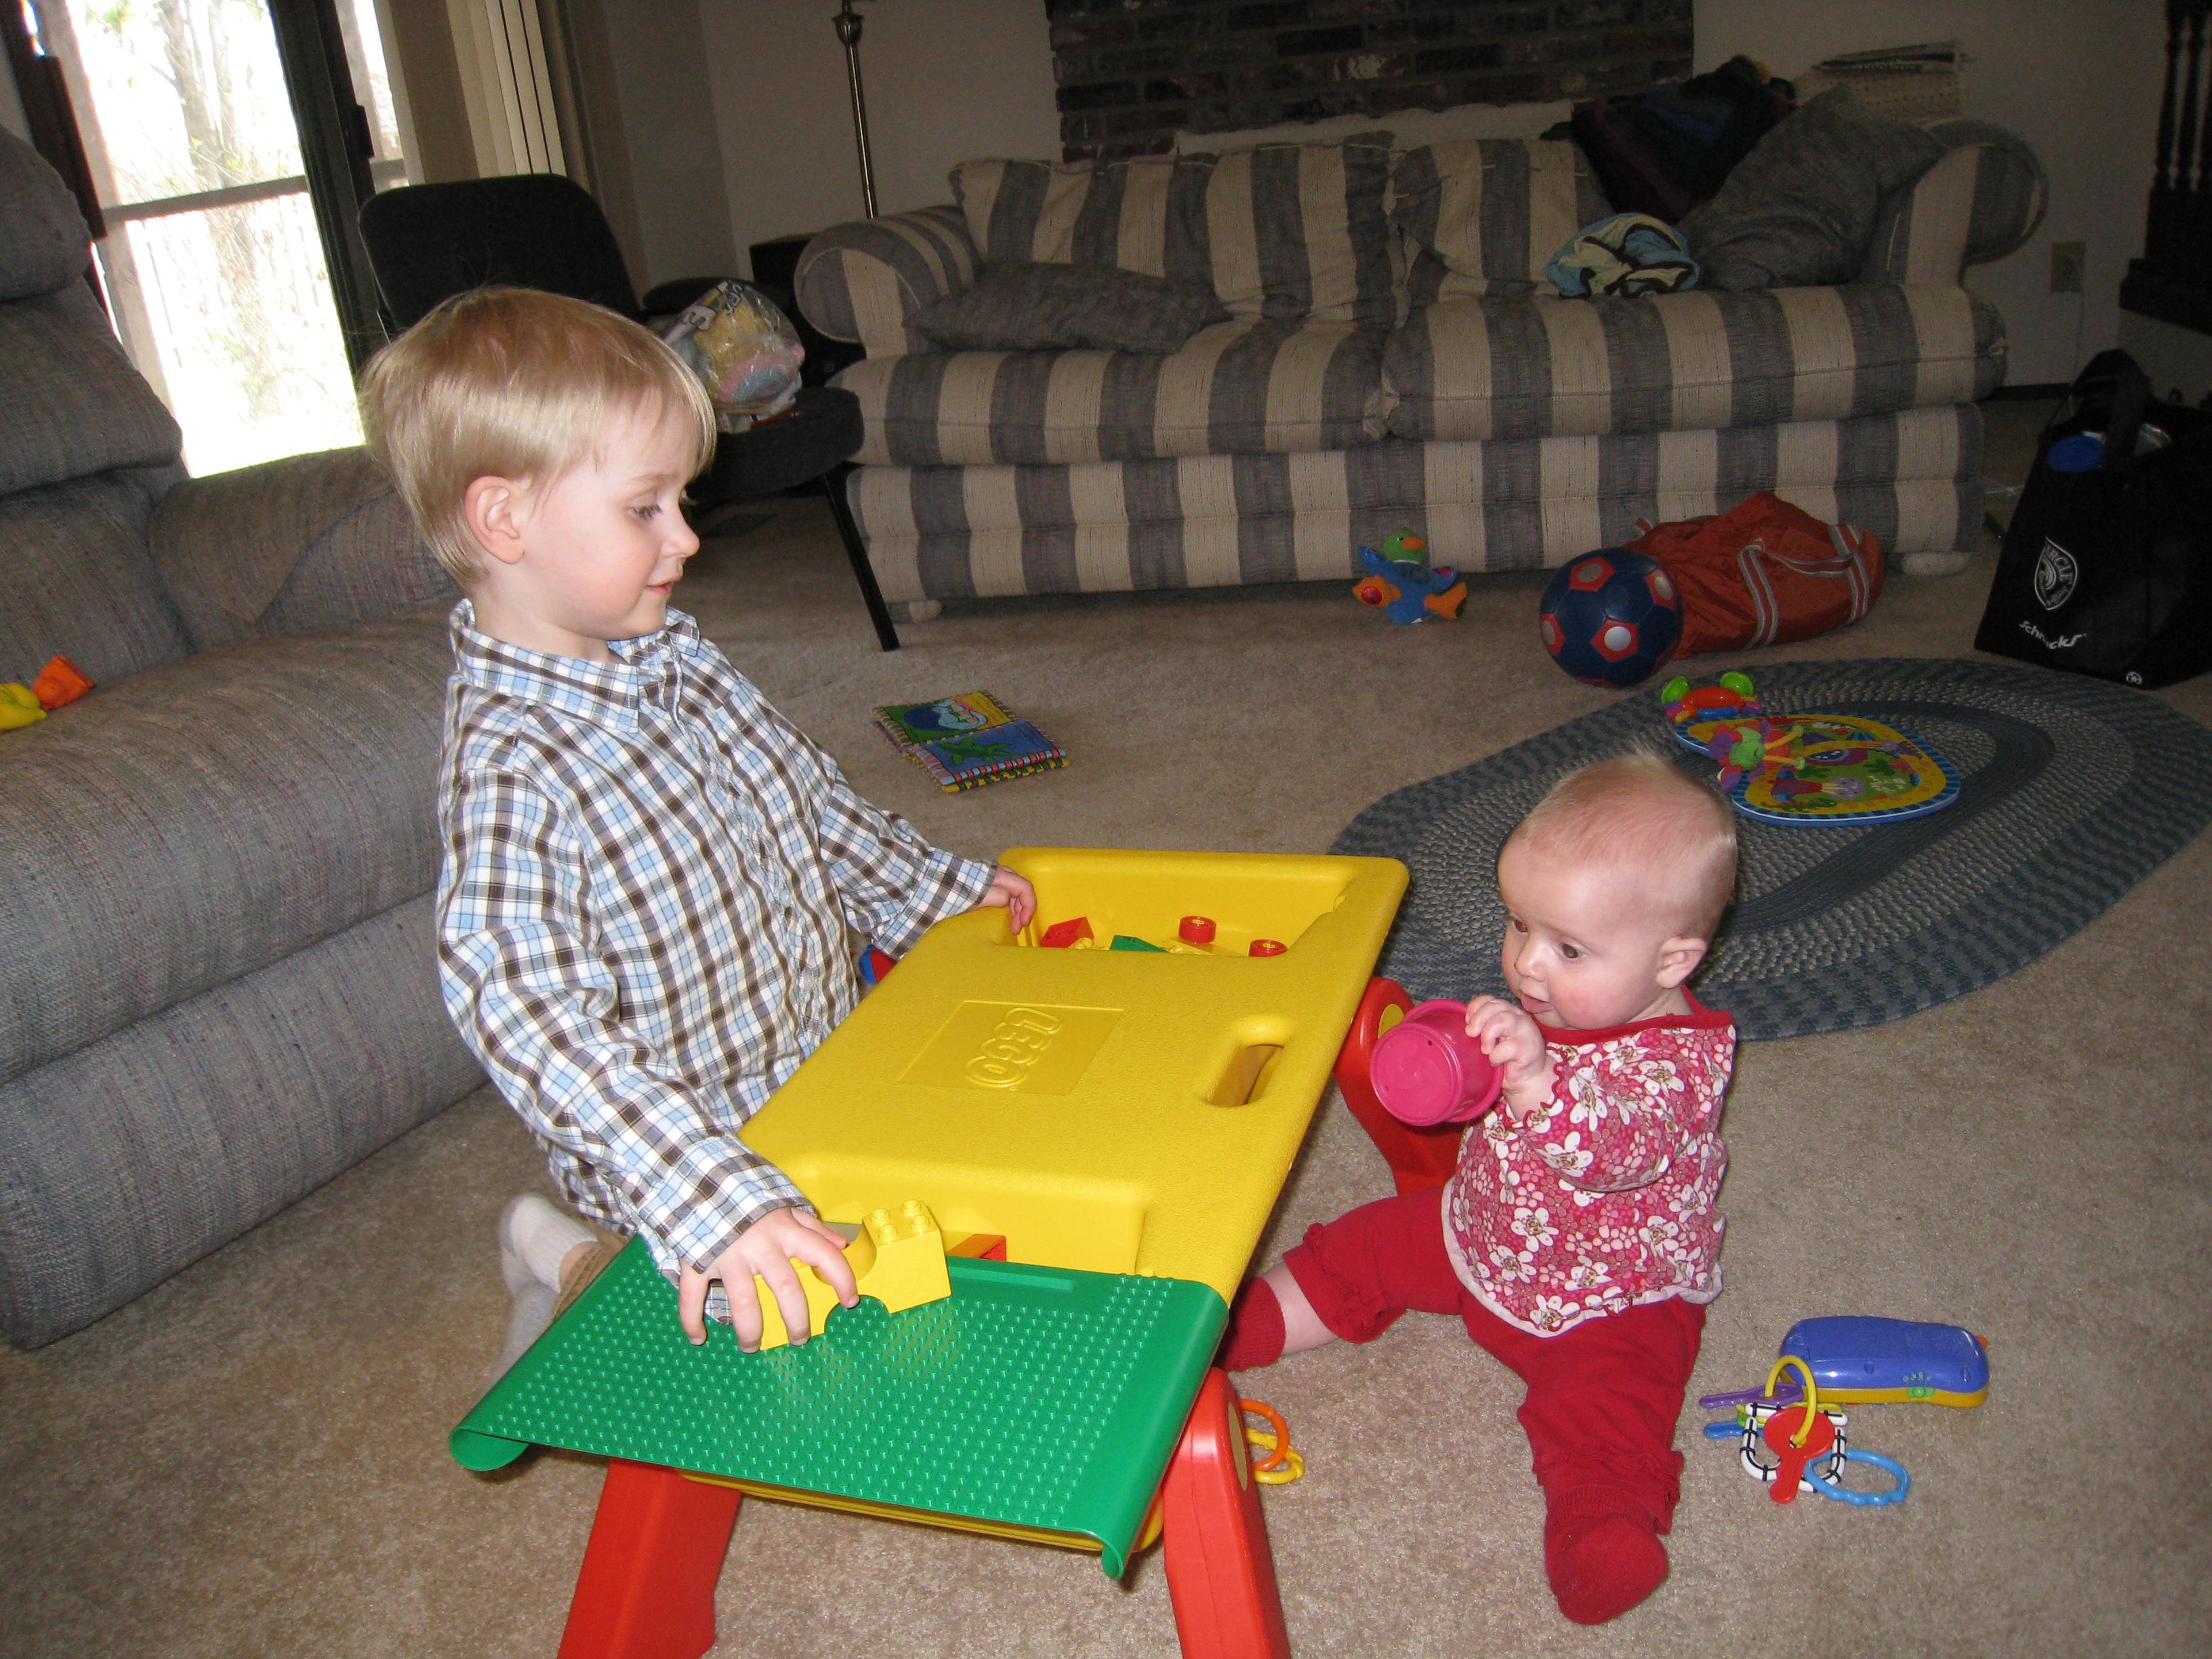 colin-and-kivrin-playing